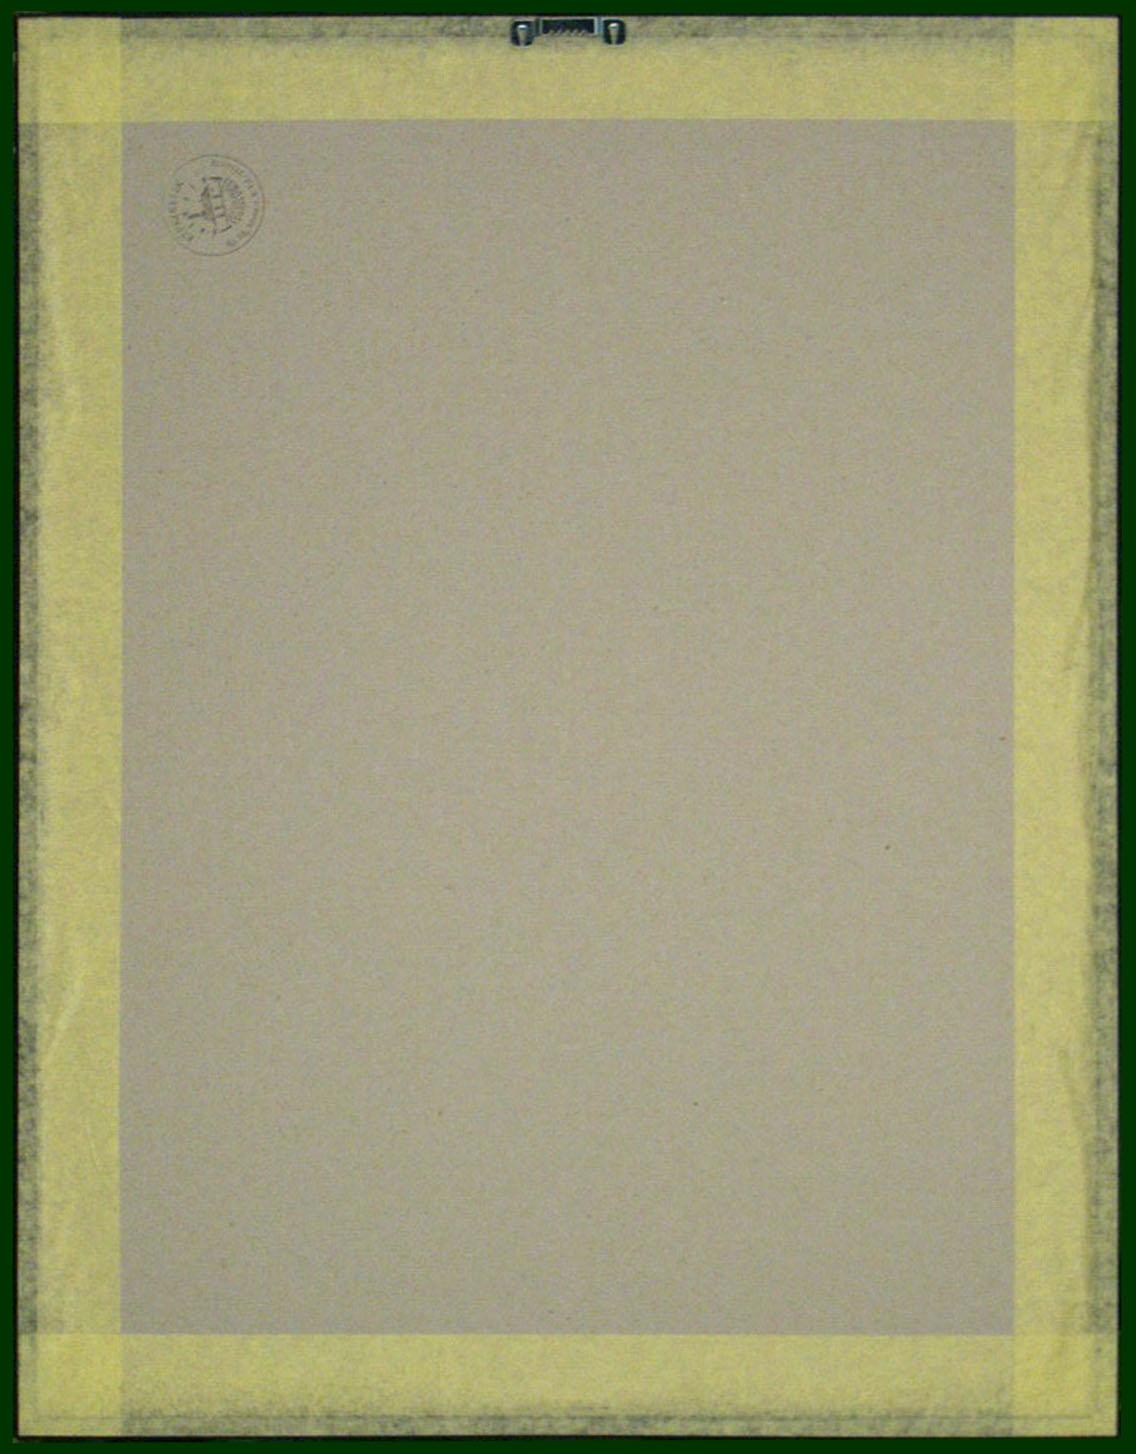 055-018hat.JPG (1136×1454)